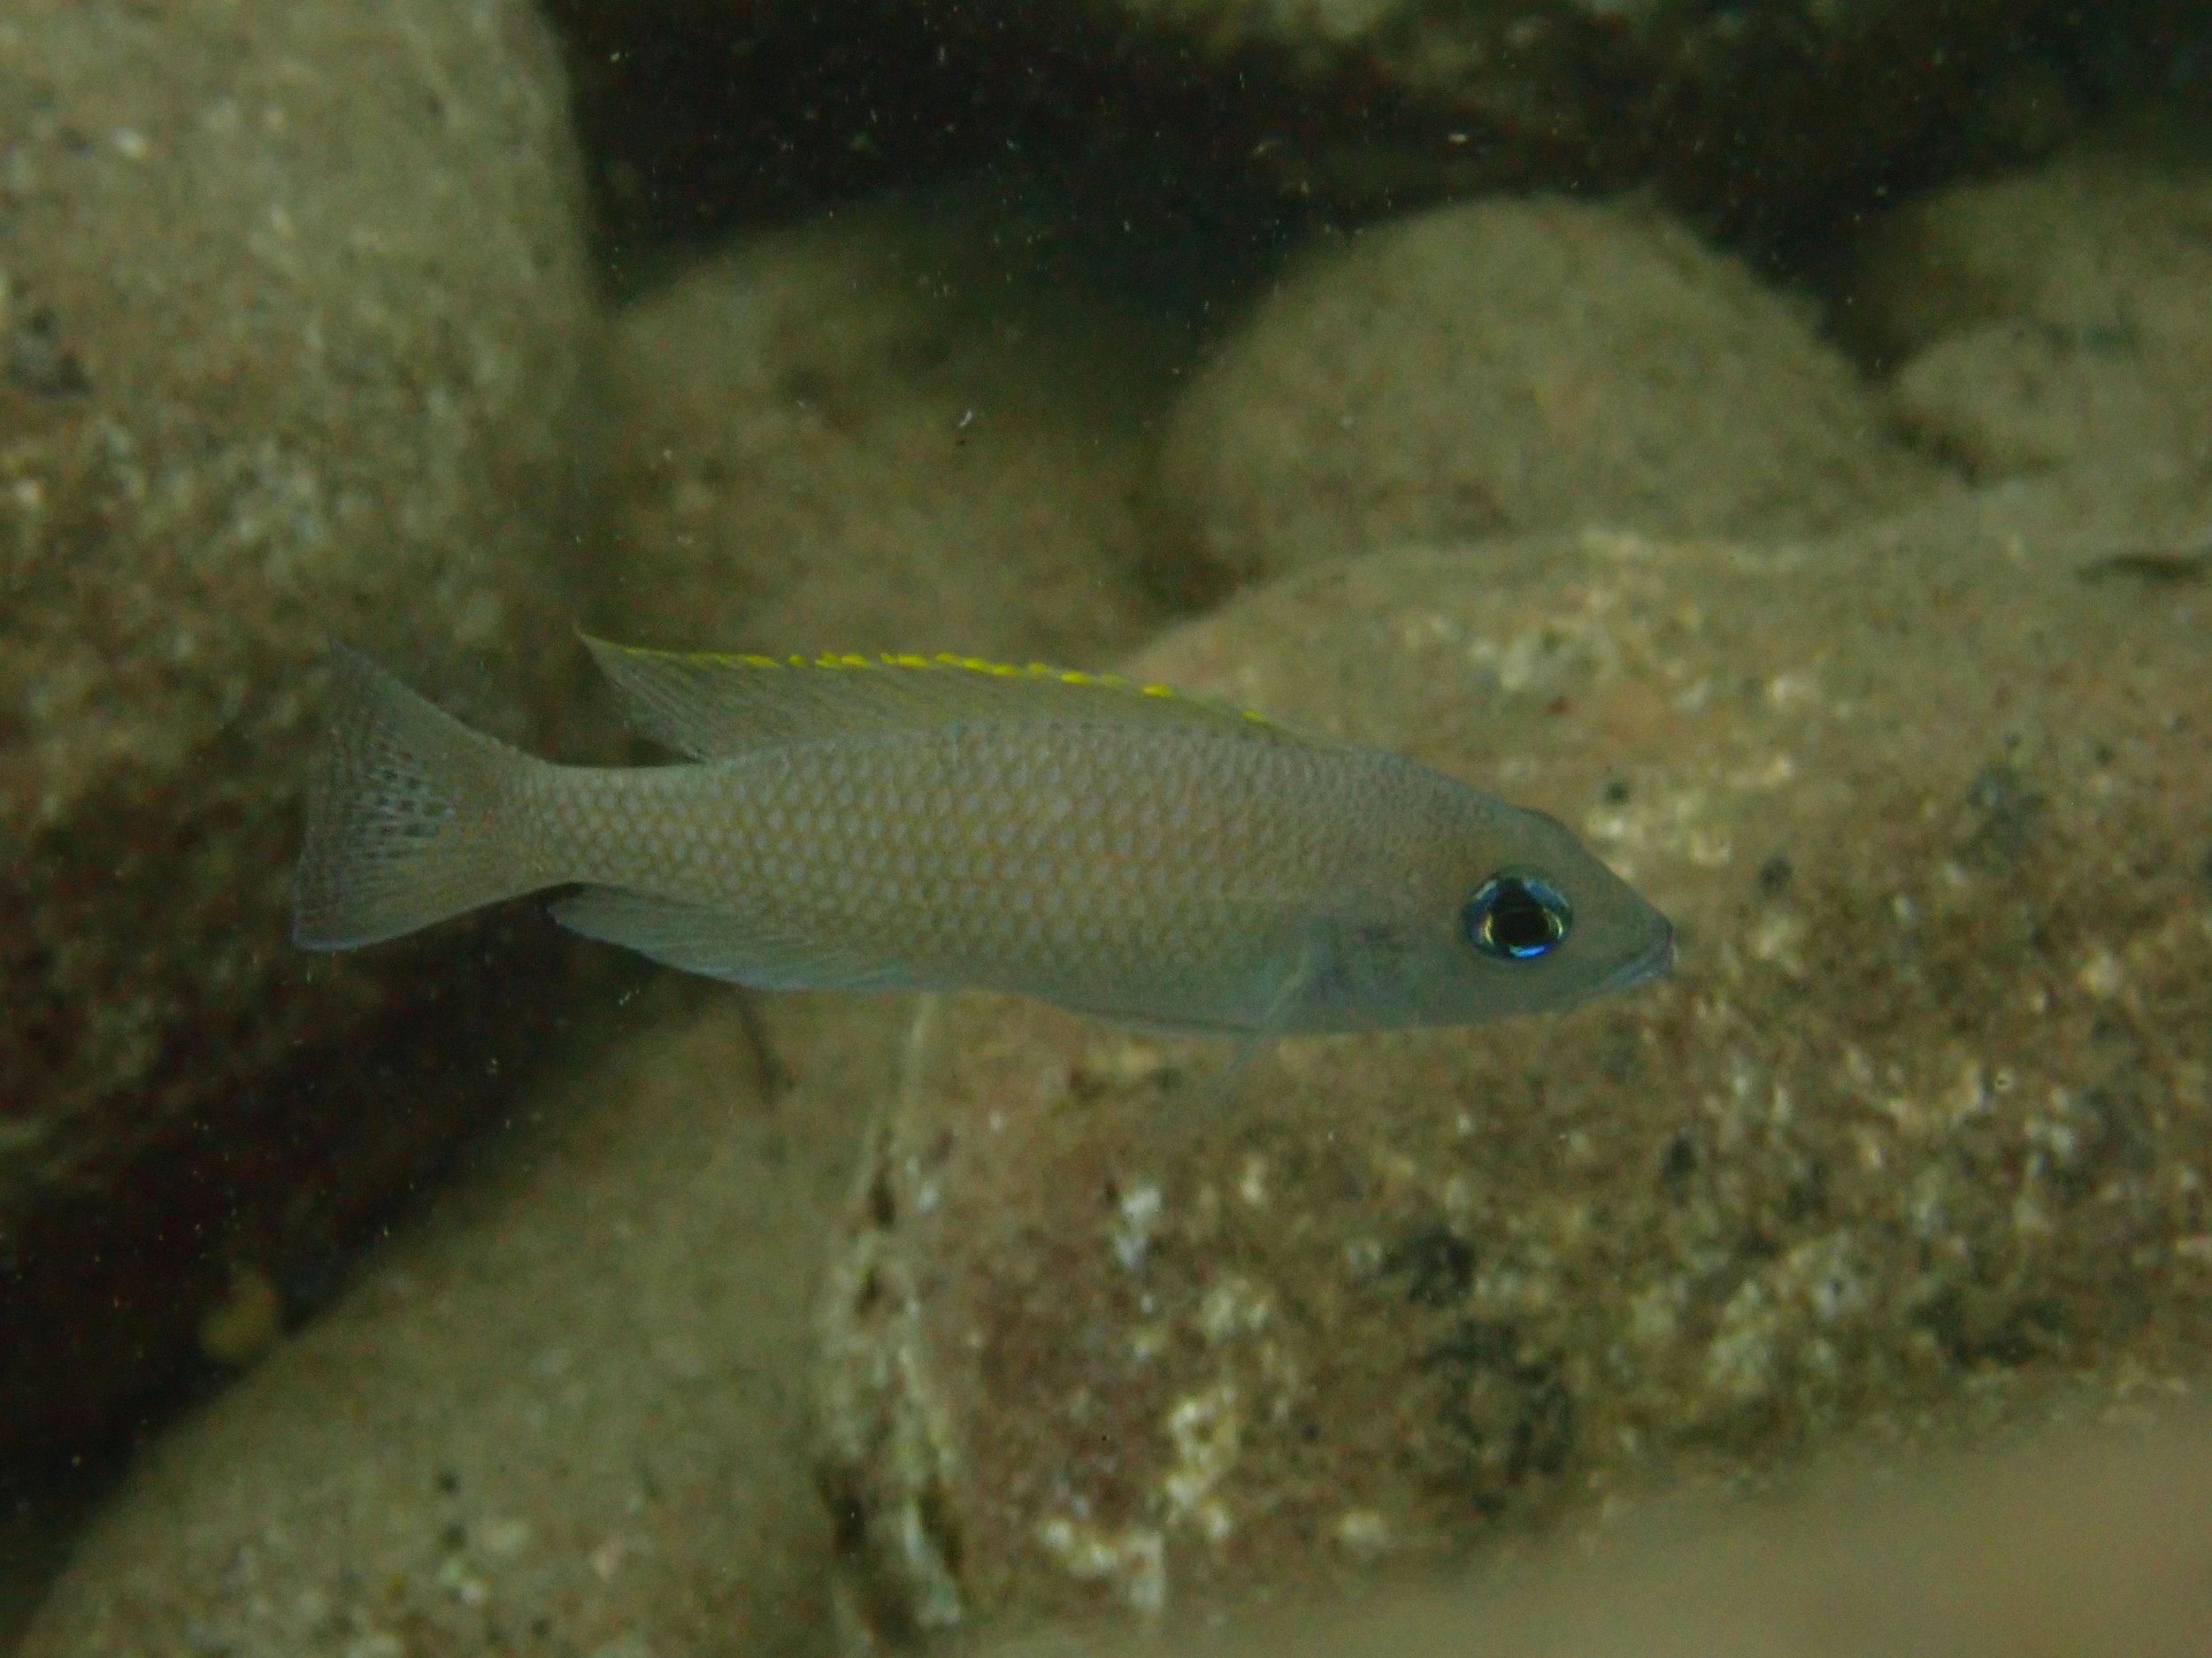 Neolamprologus caudopunctatus from Lake Tanganyika, Zambia (photo credit: Aneesh Bose)